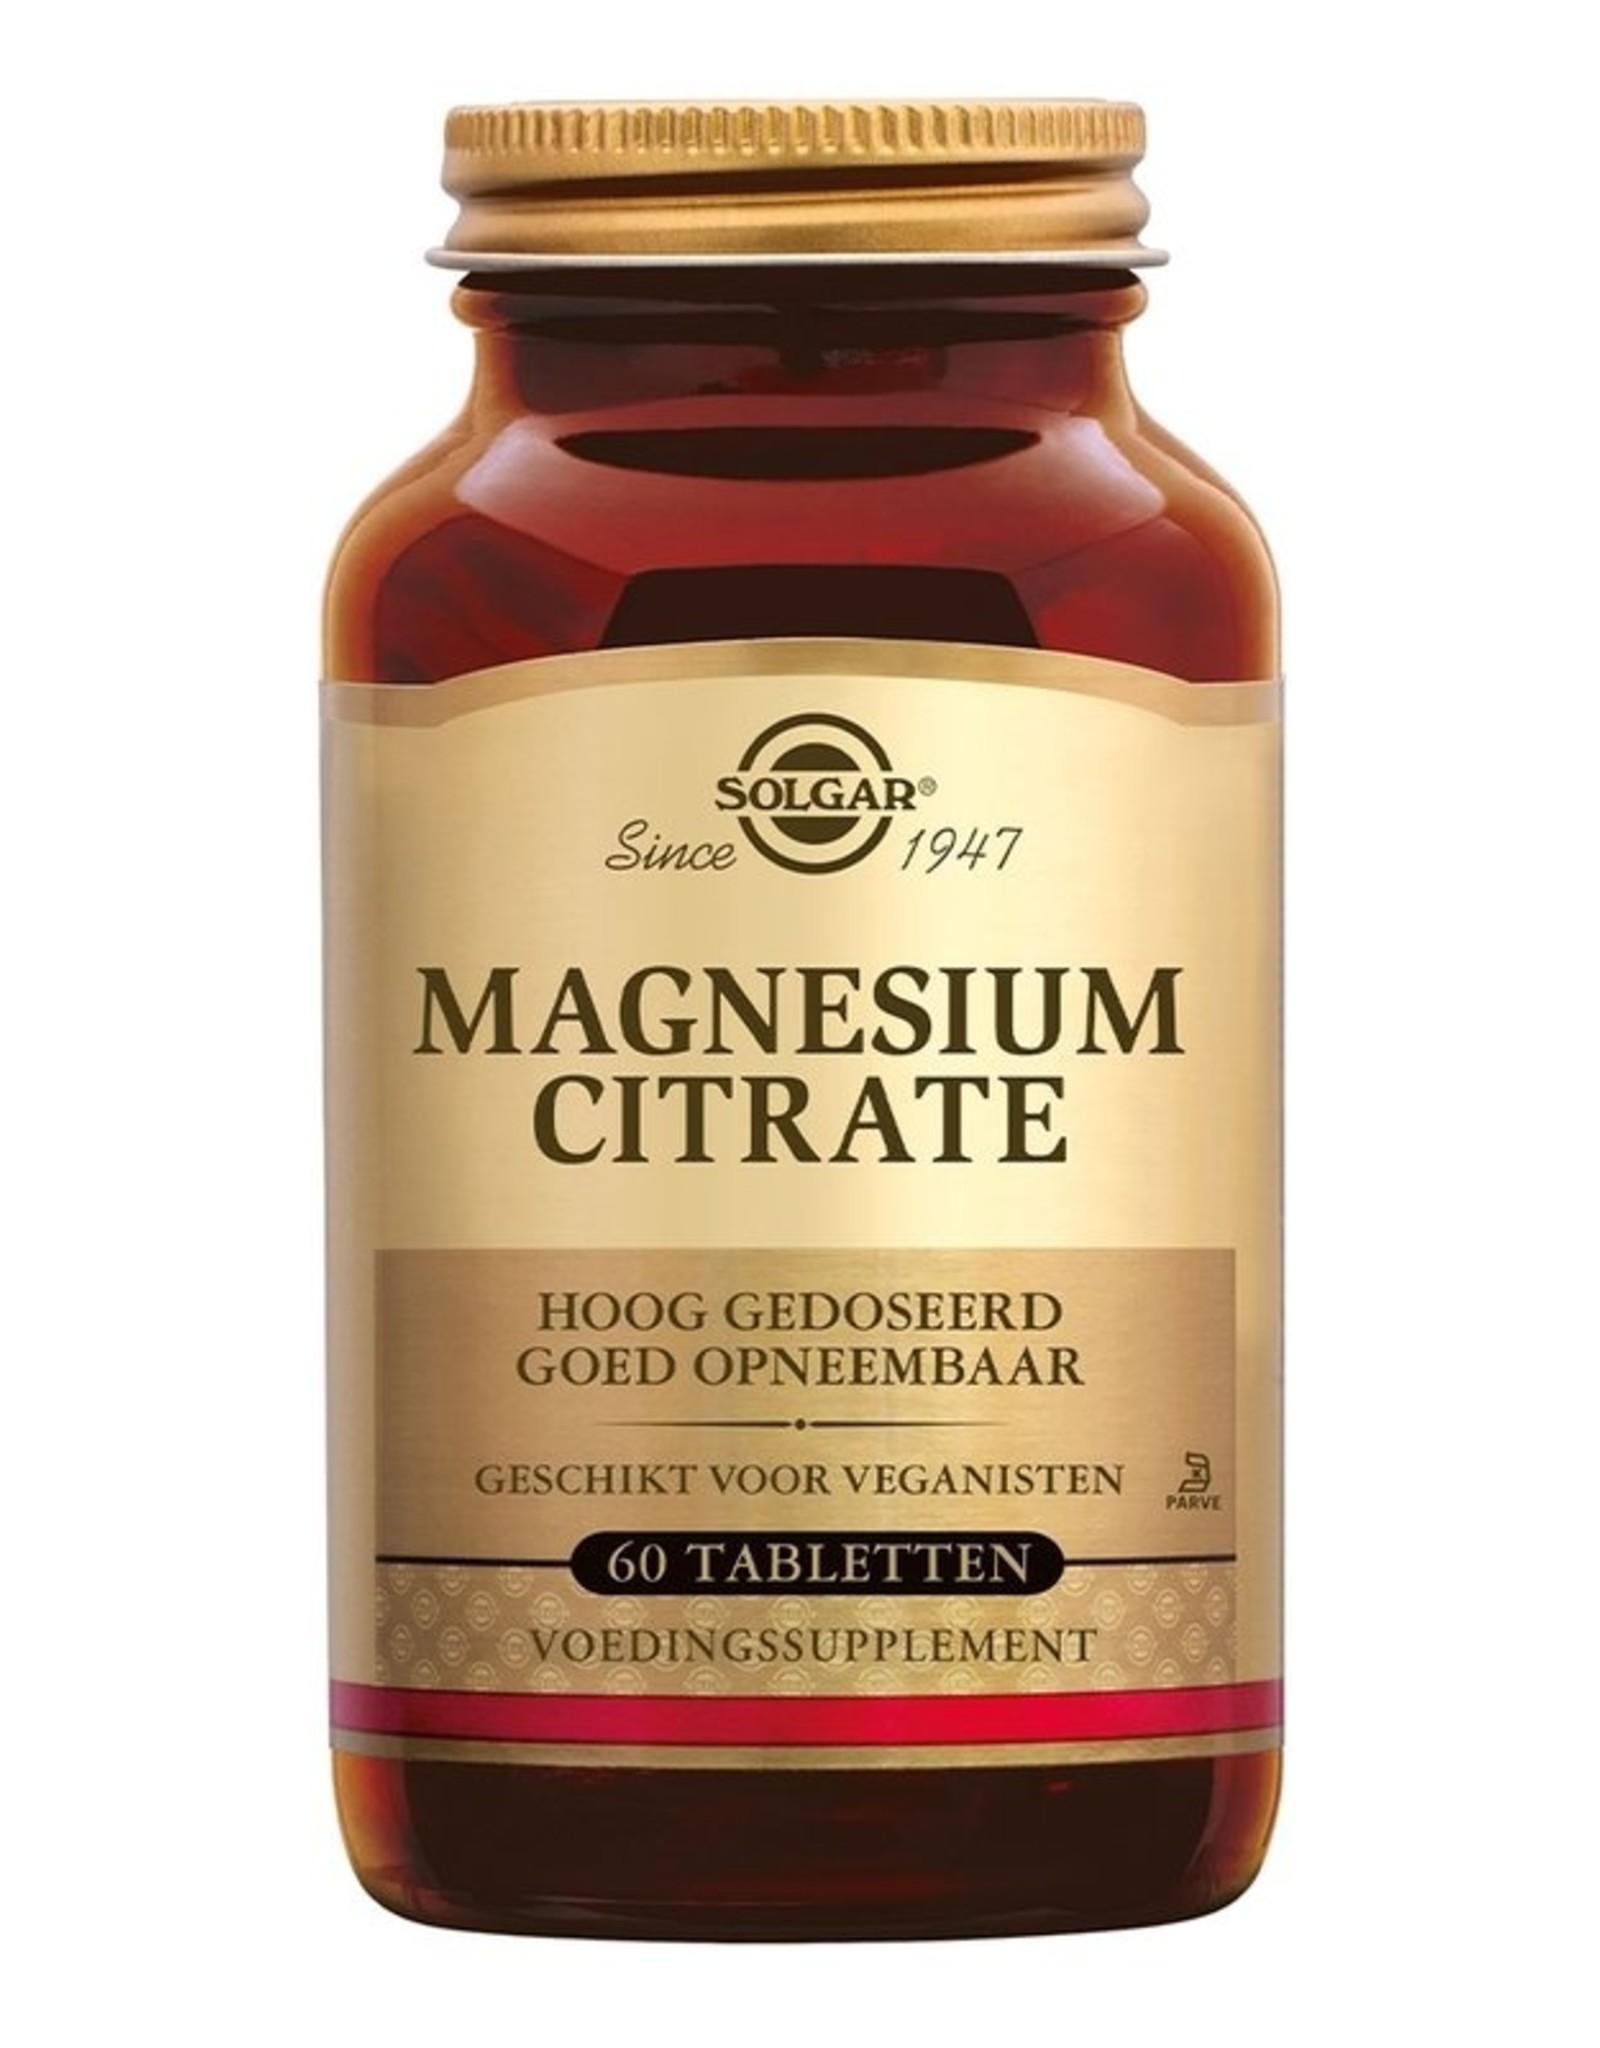 Solgar Solgar Magnesium Citrate 60 Vegan tabletten